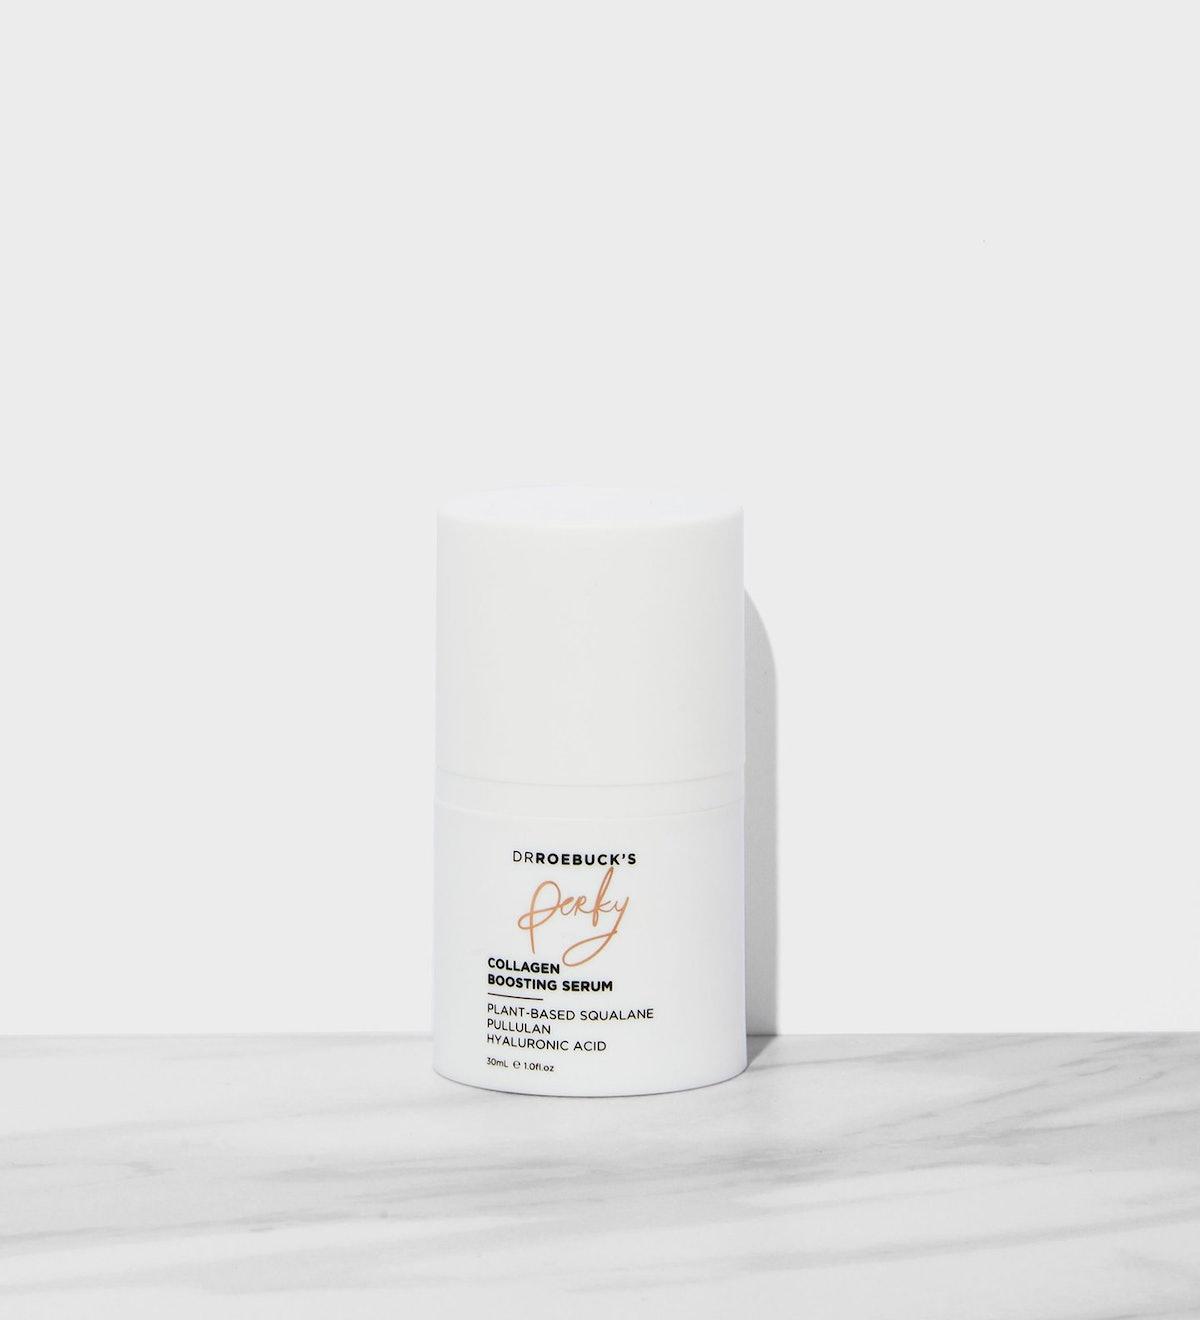 Dr. Roebuck's Perky Collagen Boosting Serum